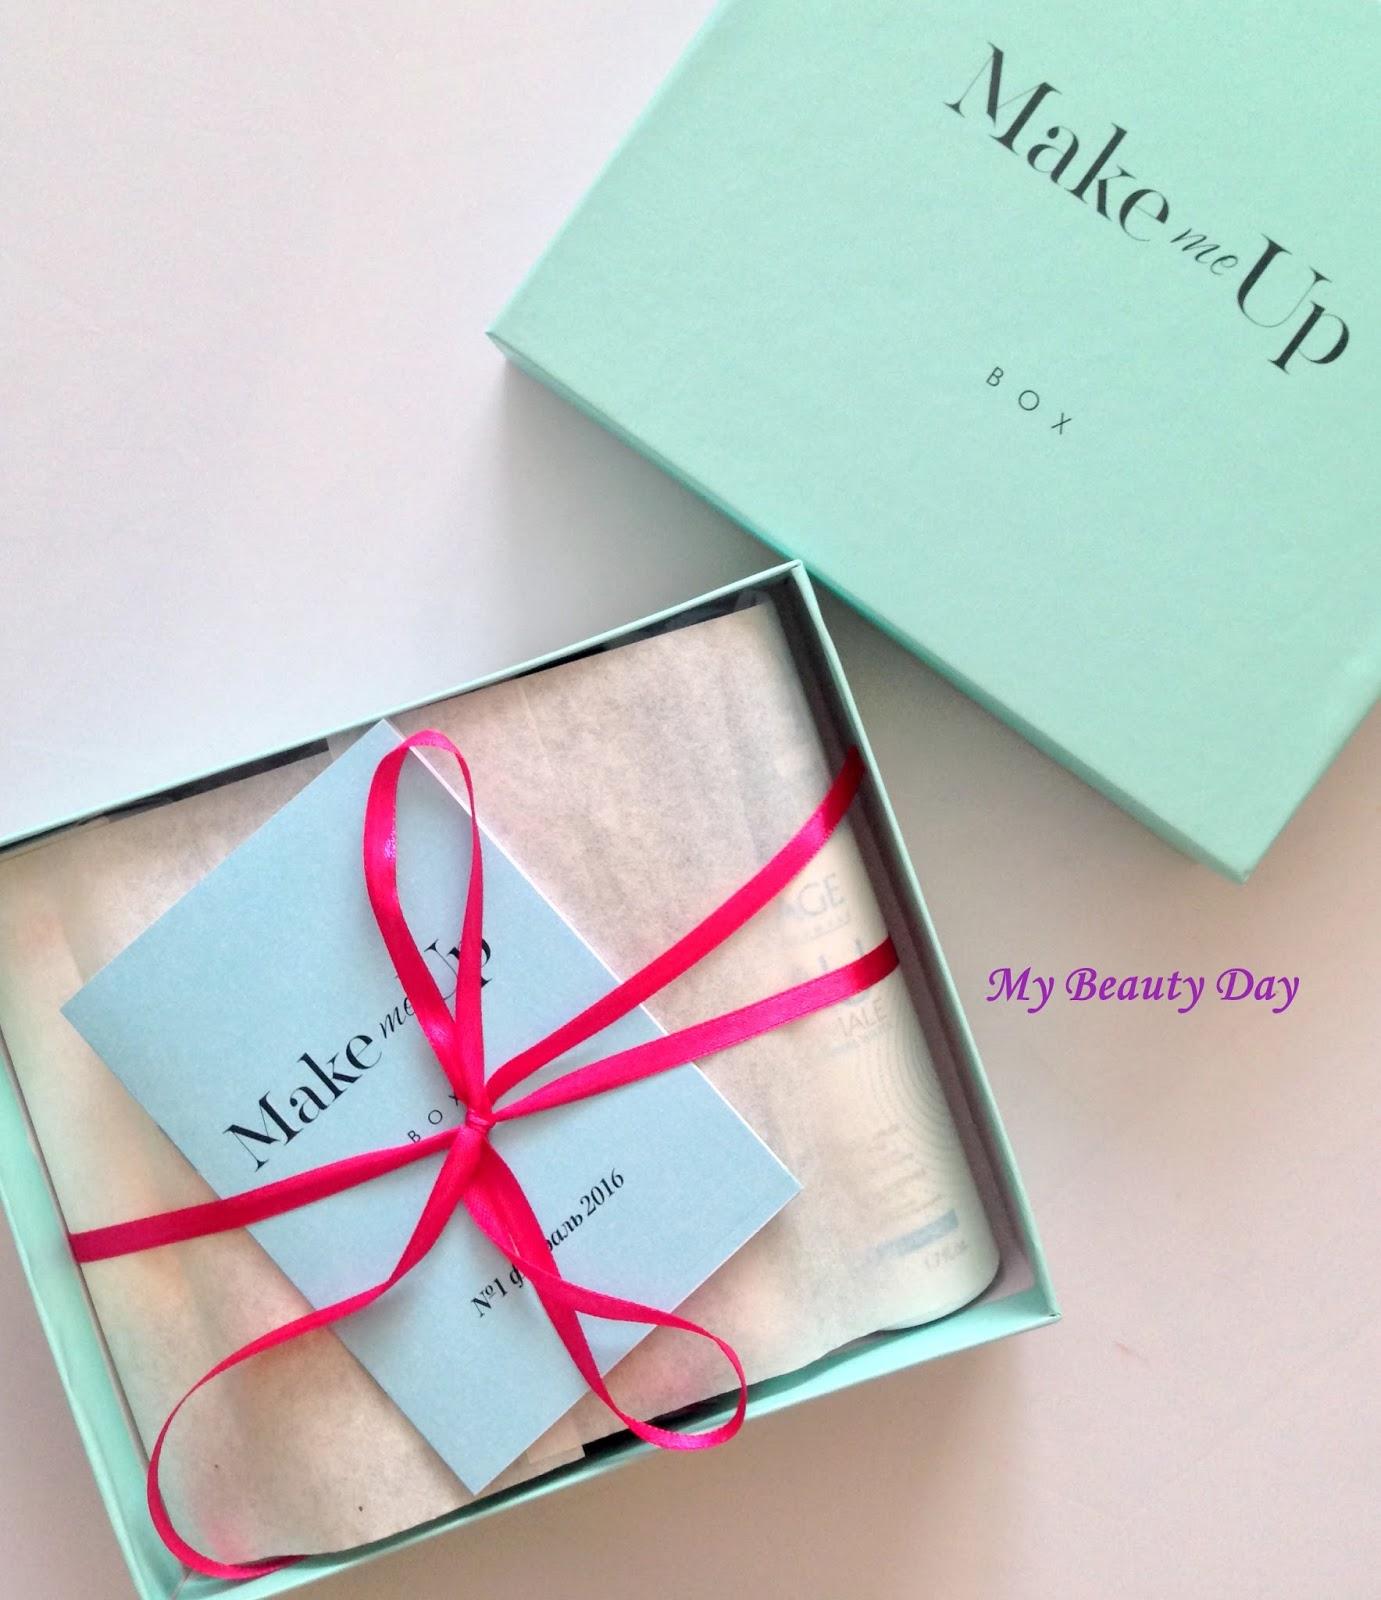 my beauty day make me up box 1 2016. Black Bedroom Furniture Sets. Home Design Ideas